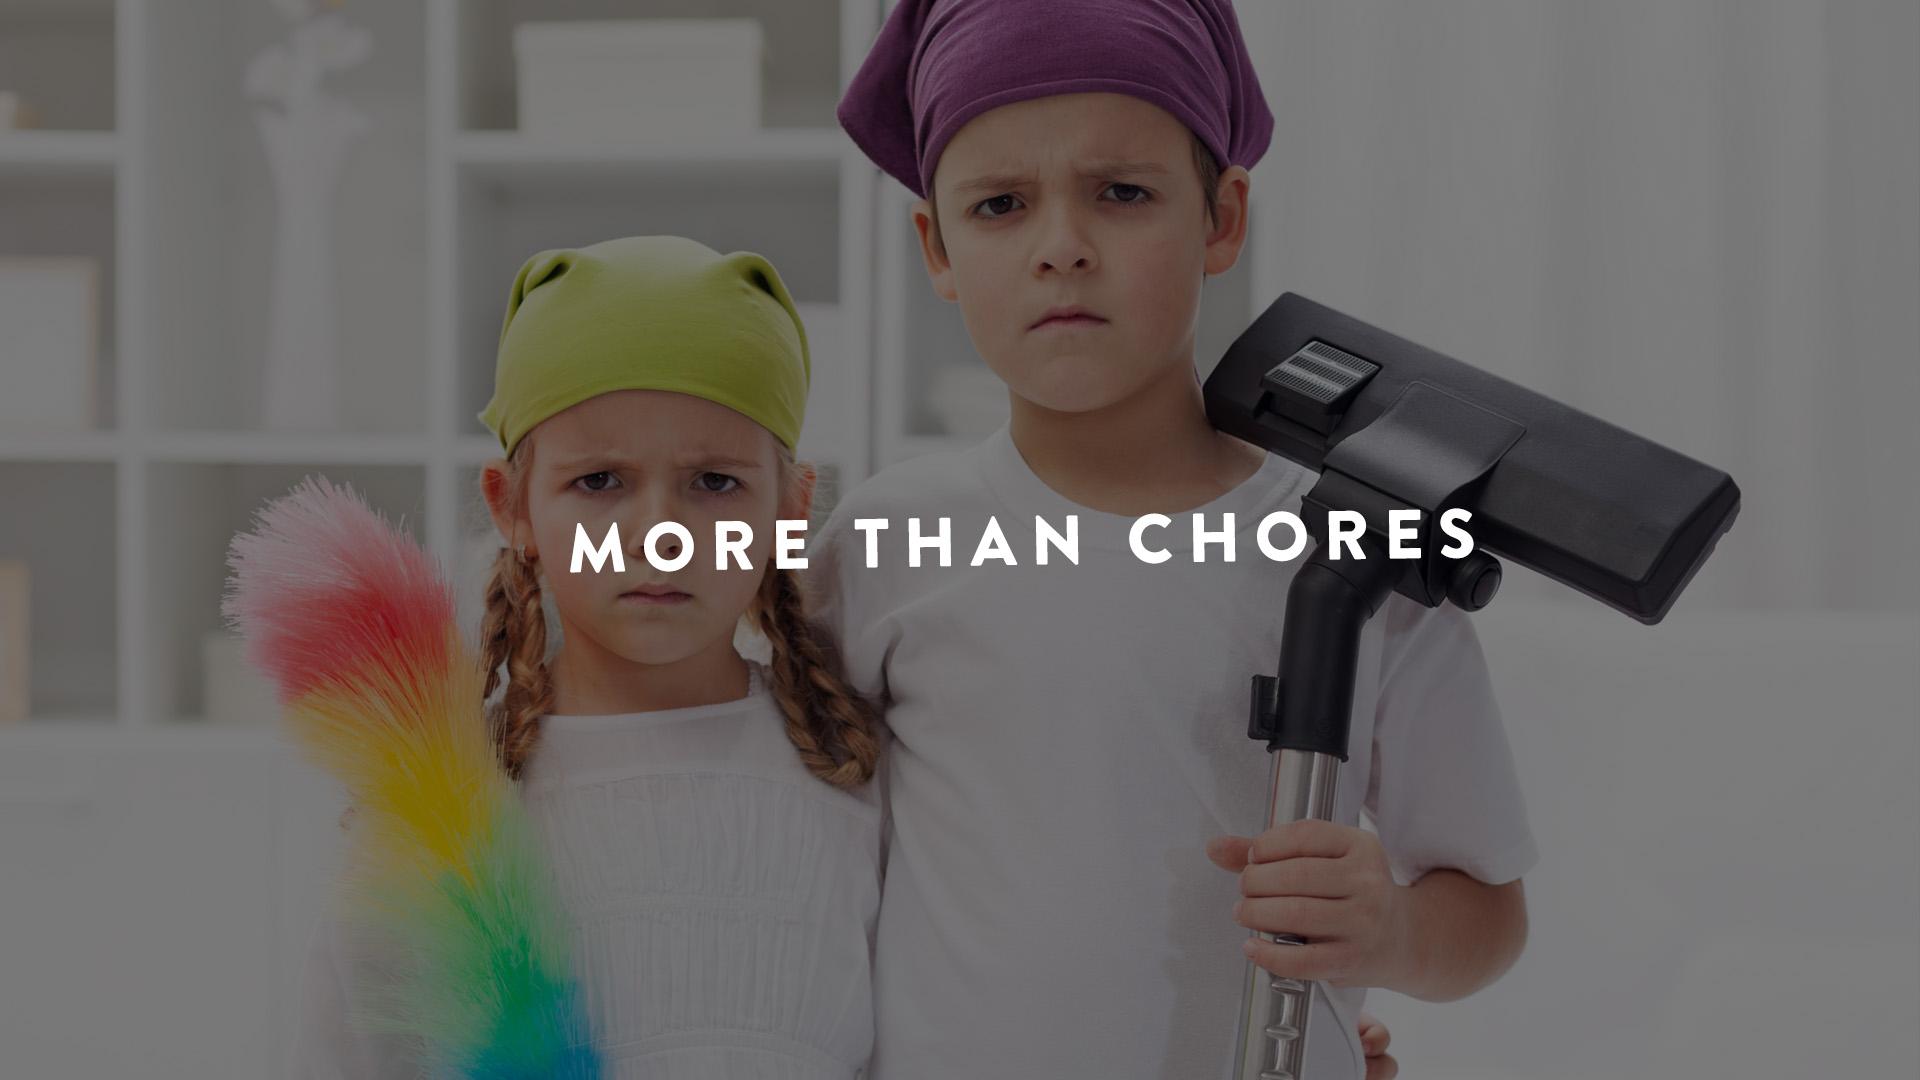 More Than Chores